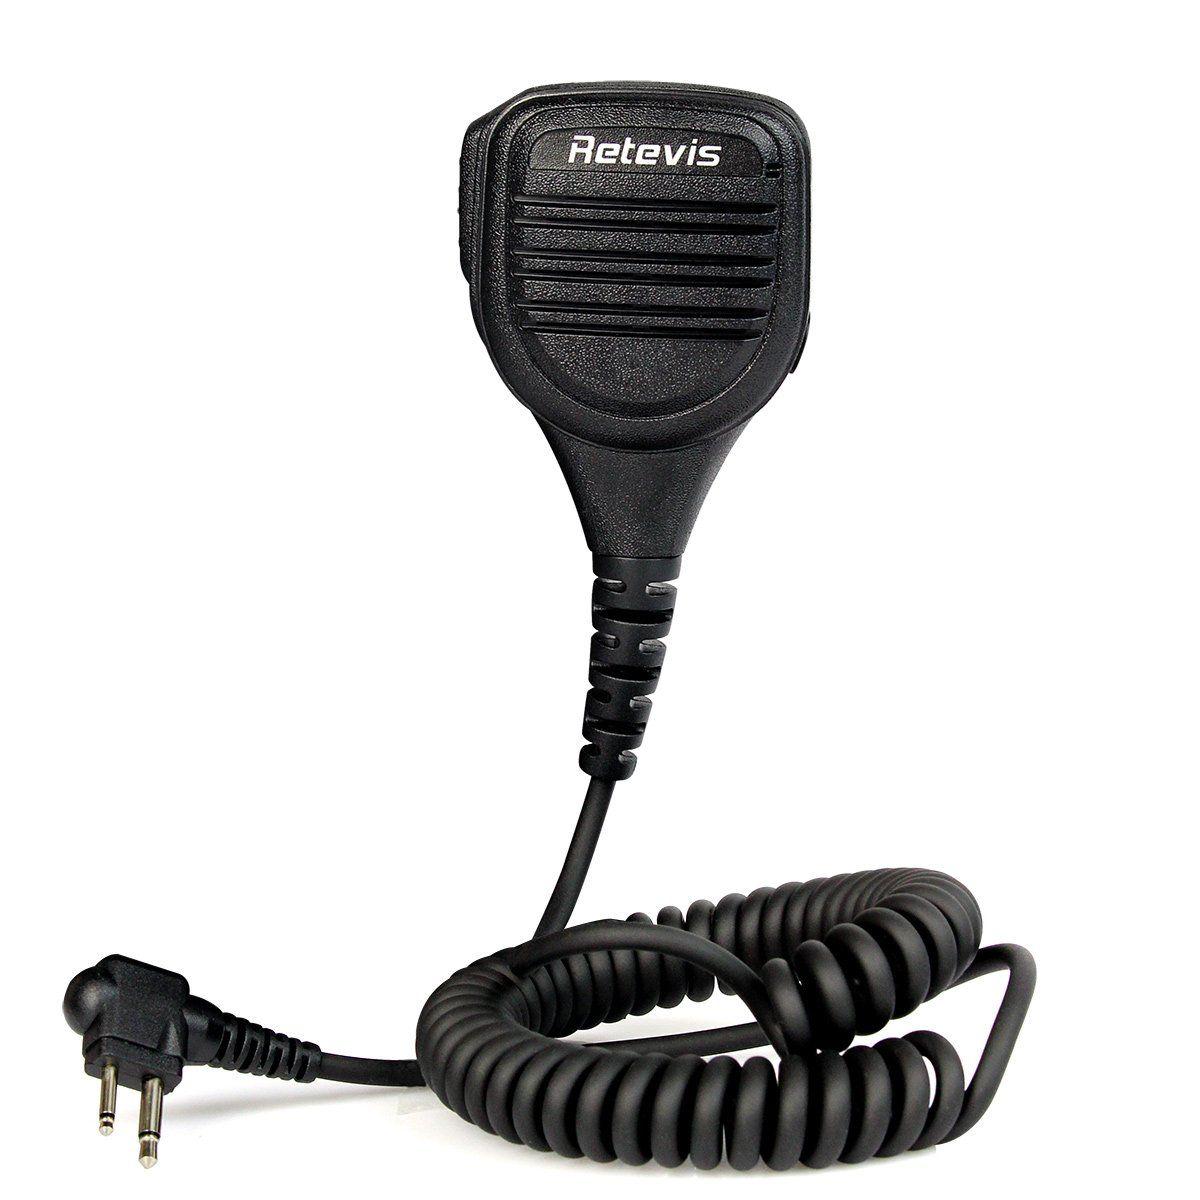 Retevis 2 Pin Speaker Mic For Motorola Gp68 Gp88 Gp300 Gp2000 Ct150 Two Way Radio 1 Pack Walkie Talkie Two Way Radio Motorola